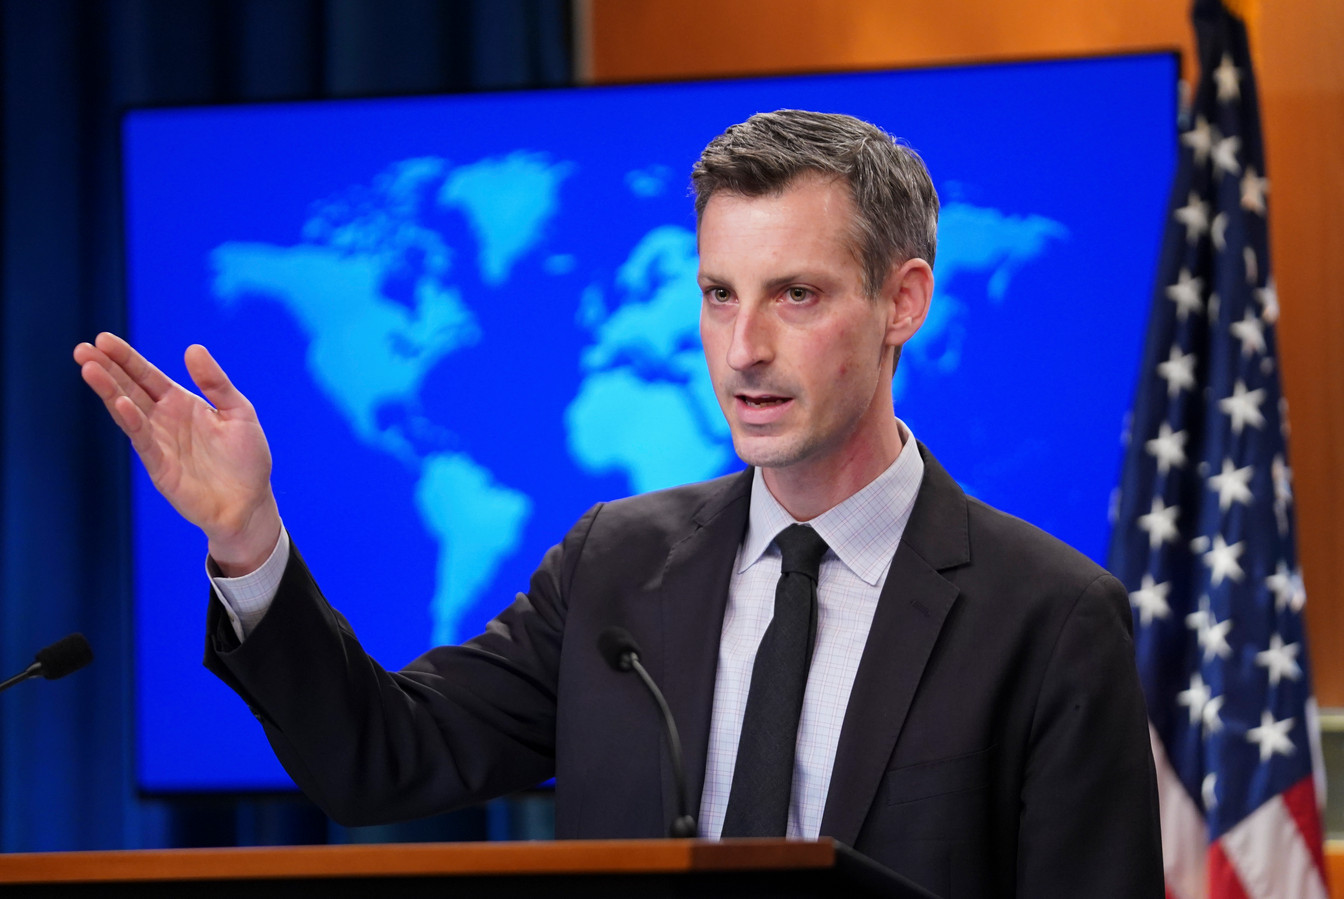 Le porte-parole de la diplomatie américaine Ned Price.